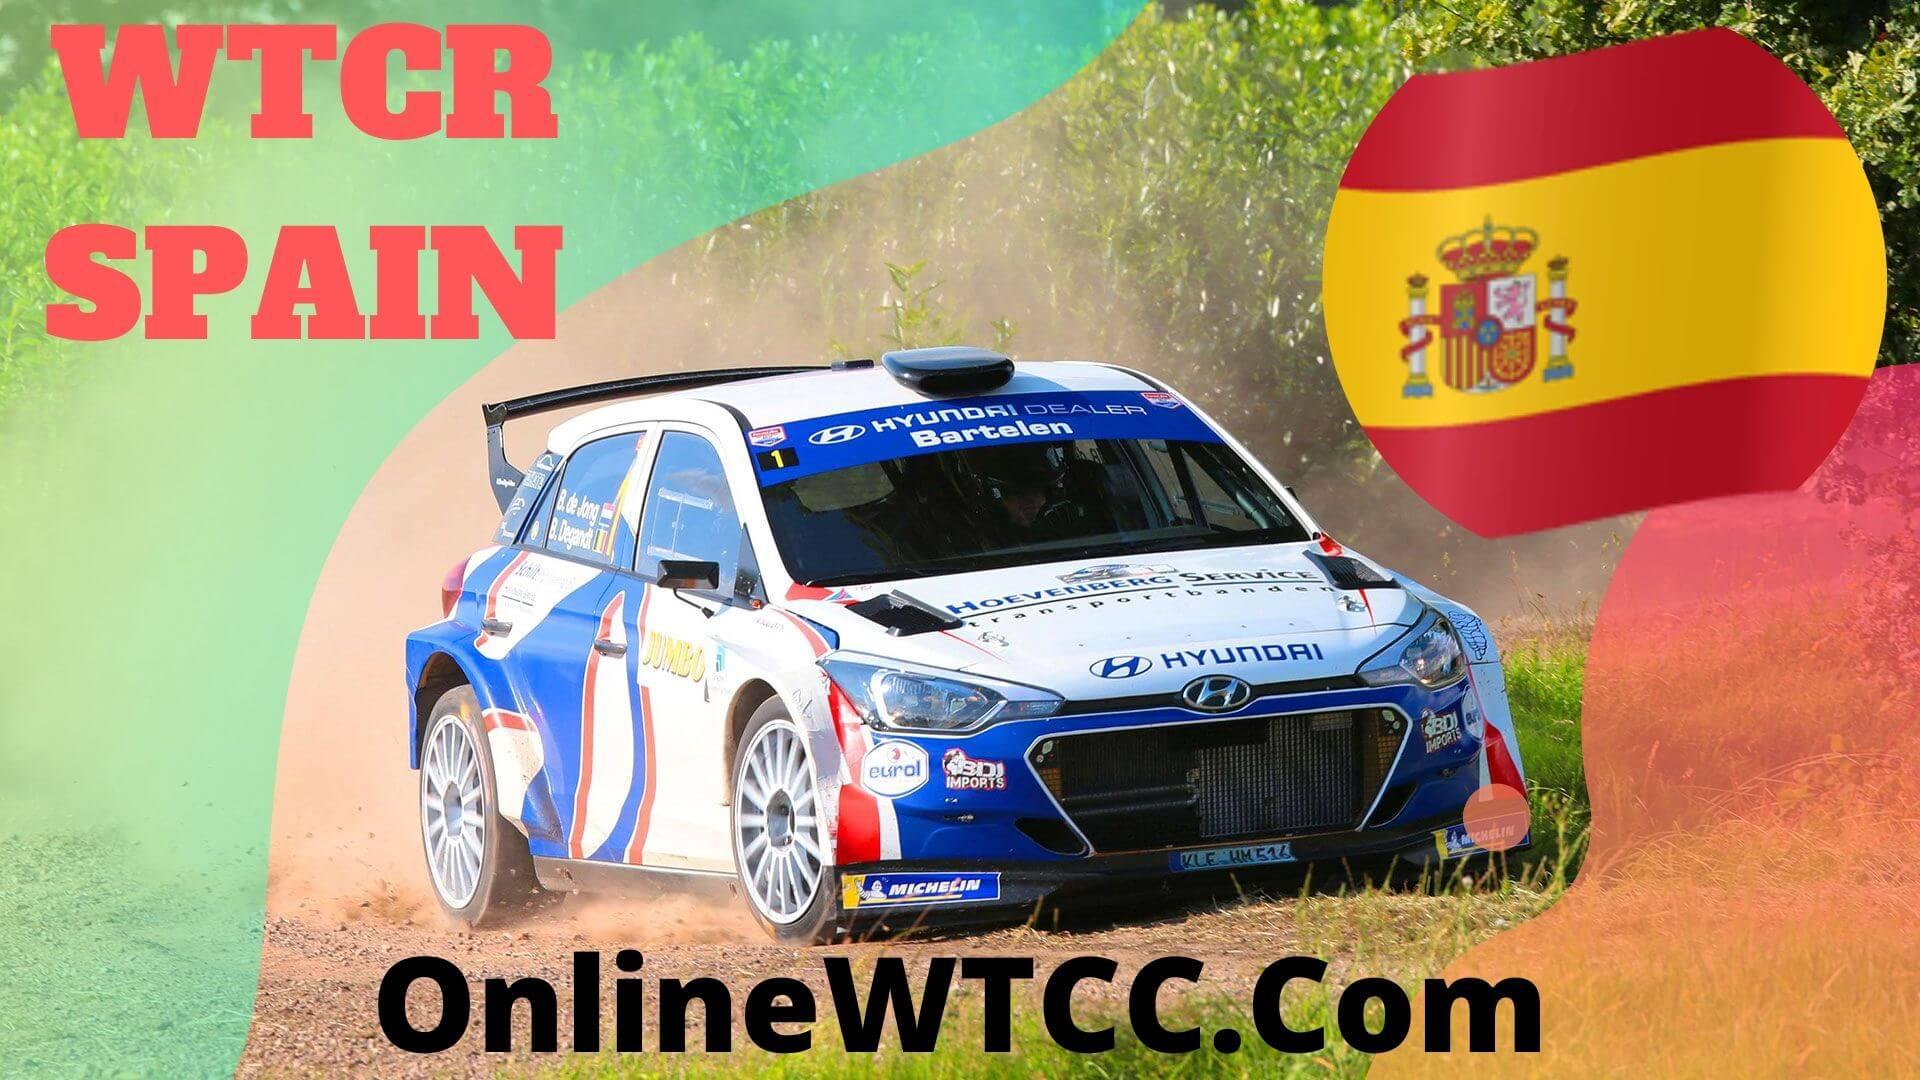 Spain WTCR Live Stream 2020 | Aragon